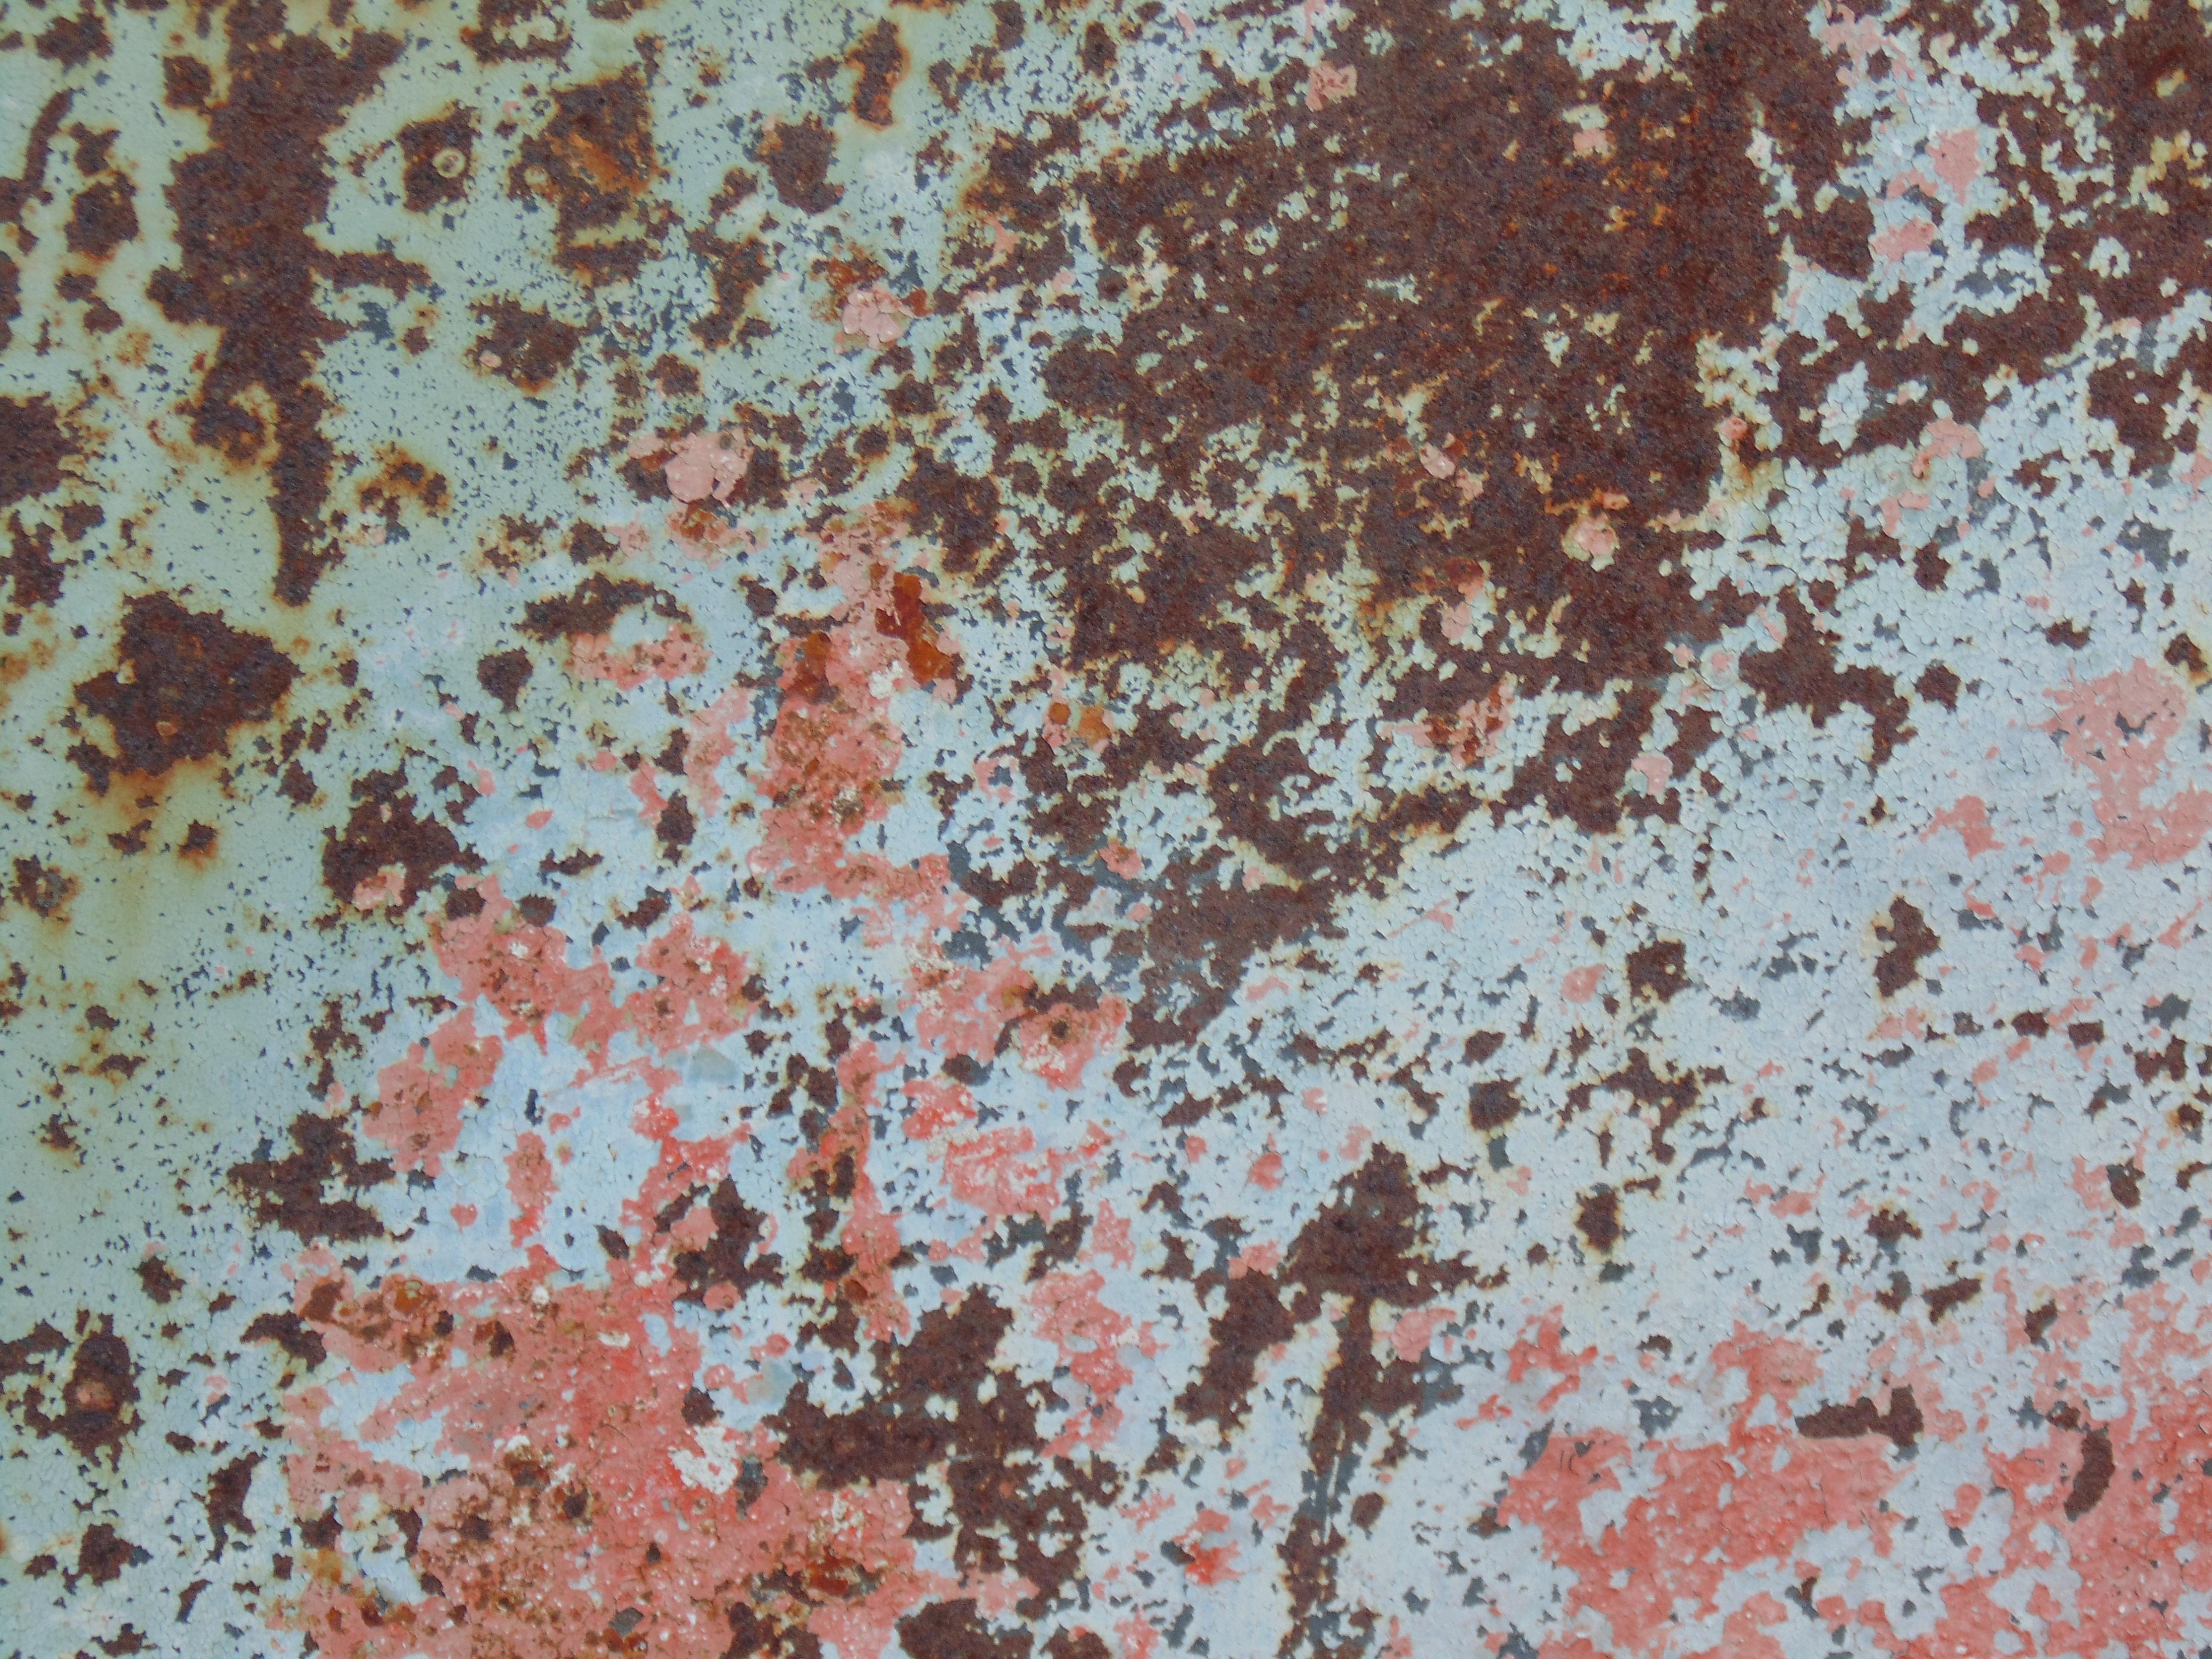 Trama di sfondo blu in marmo foto di stock  istock